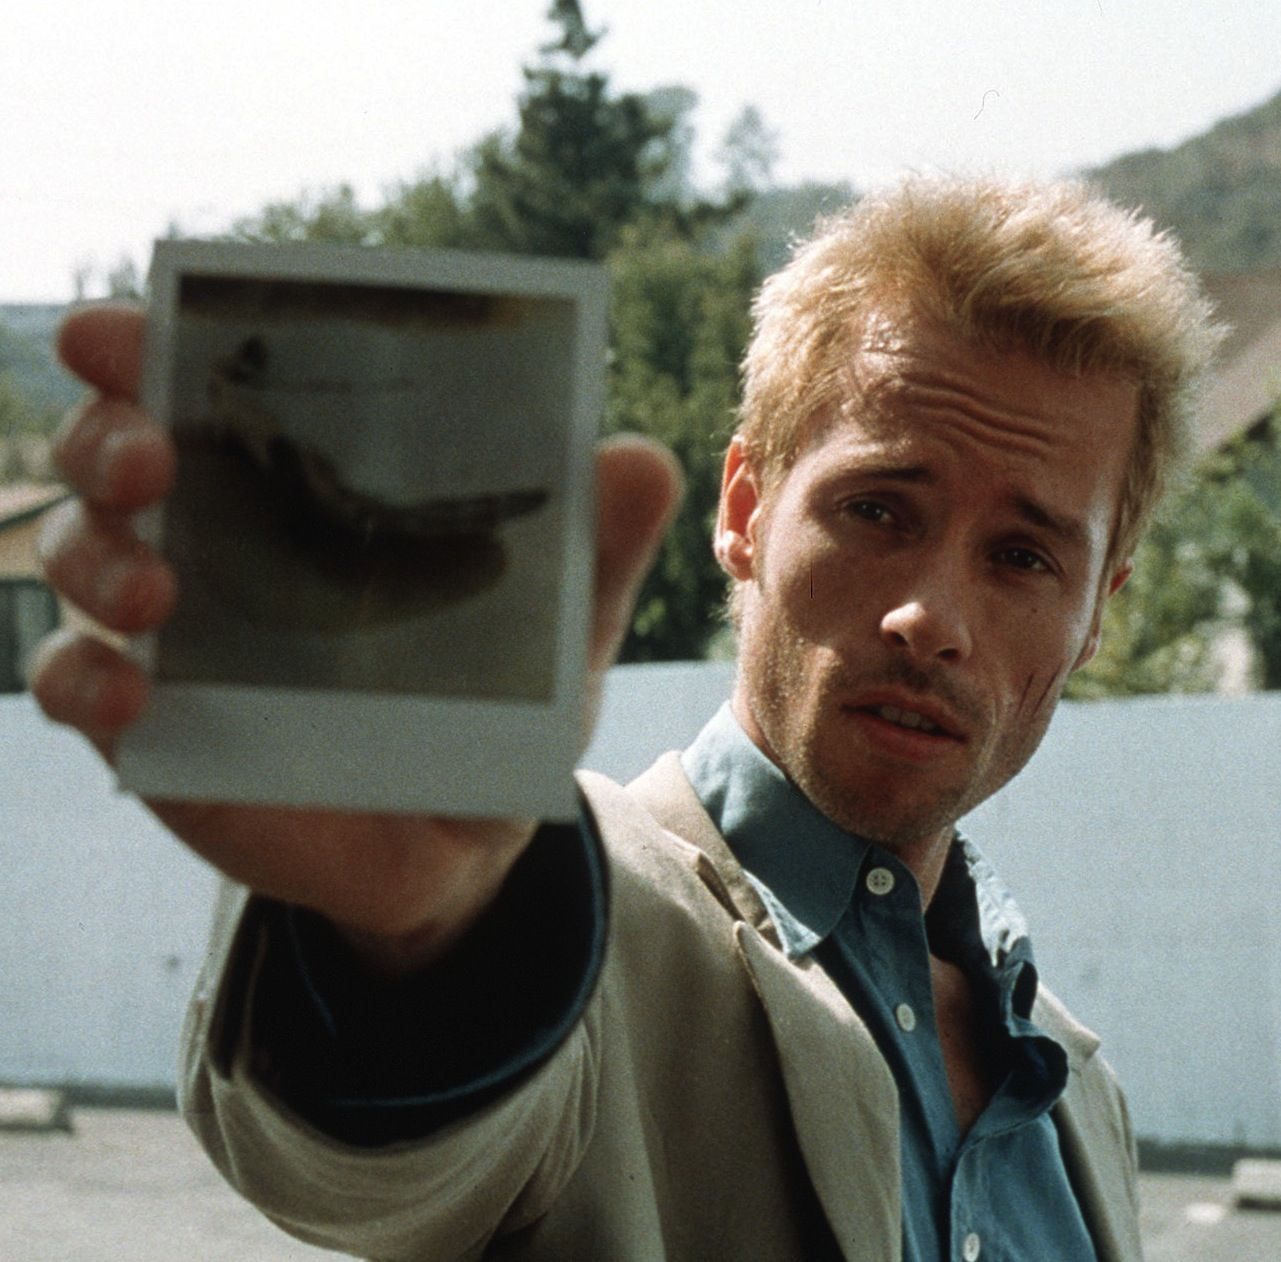 Leonard Shelby, Memento Good movies on netflix, Guy